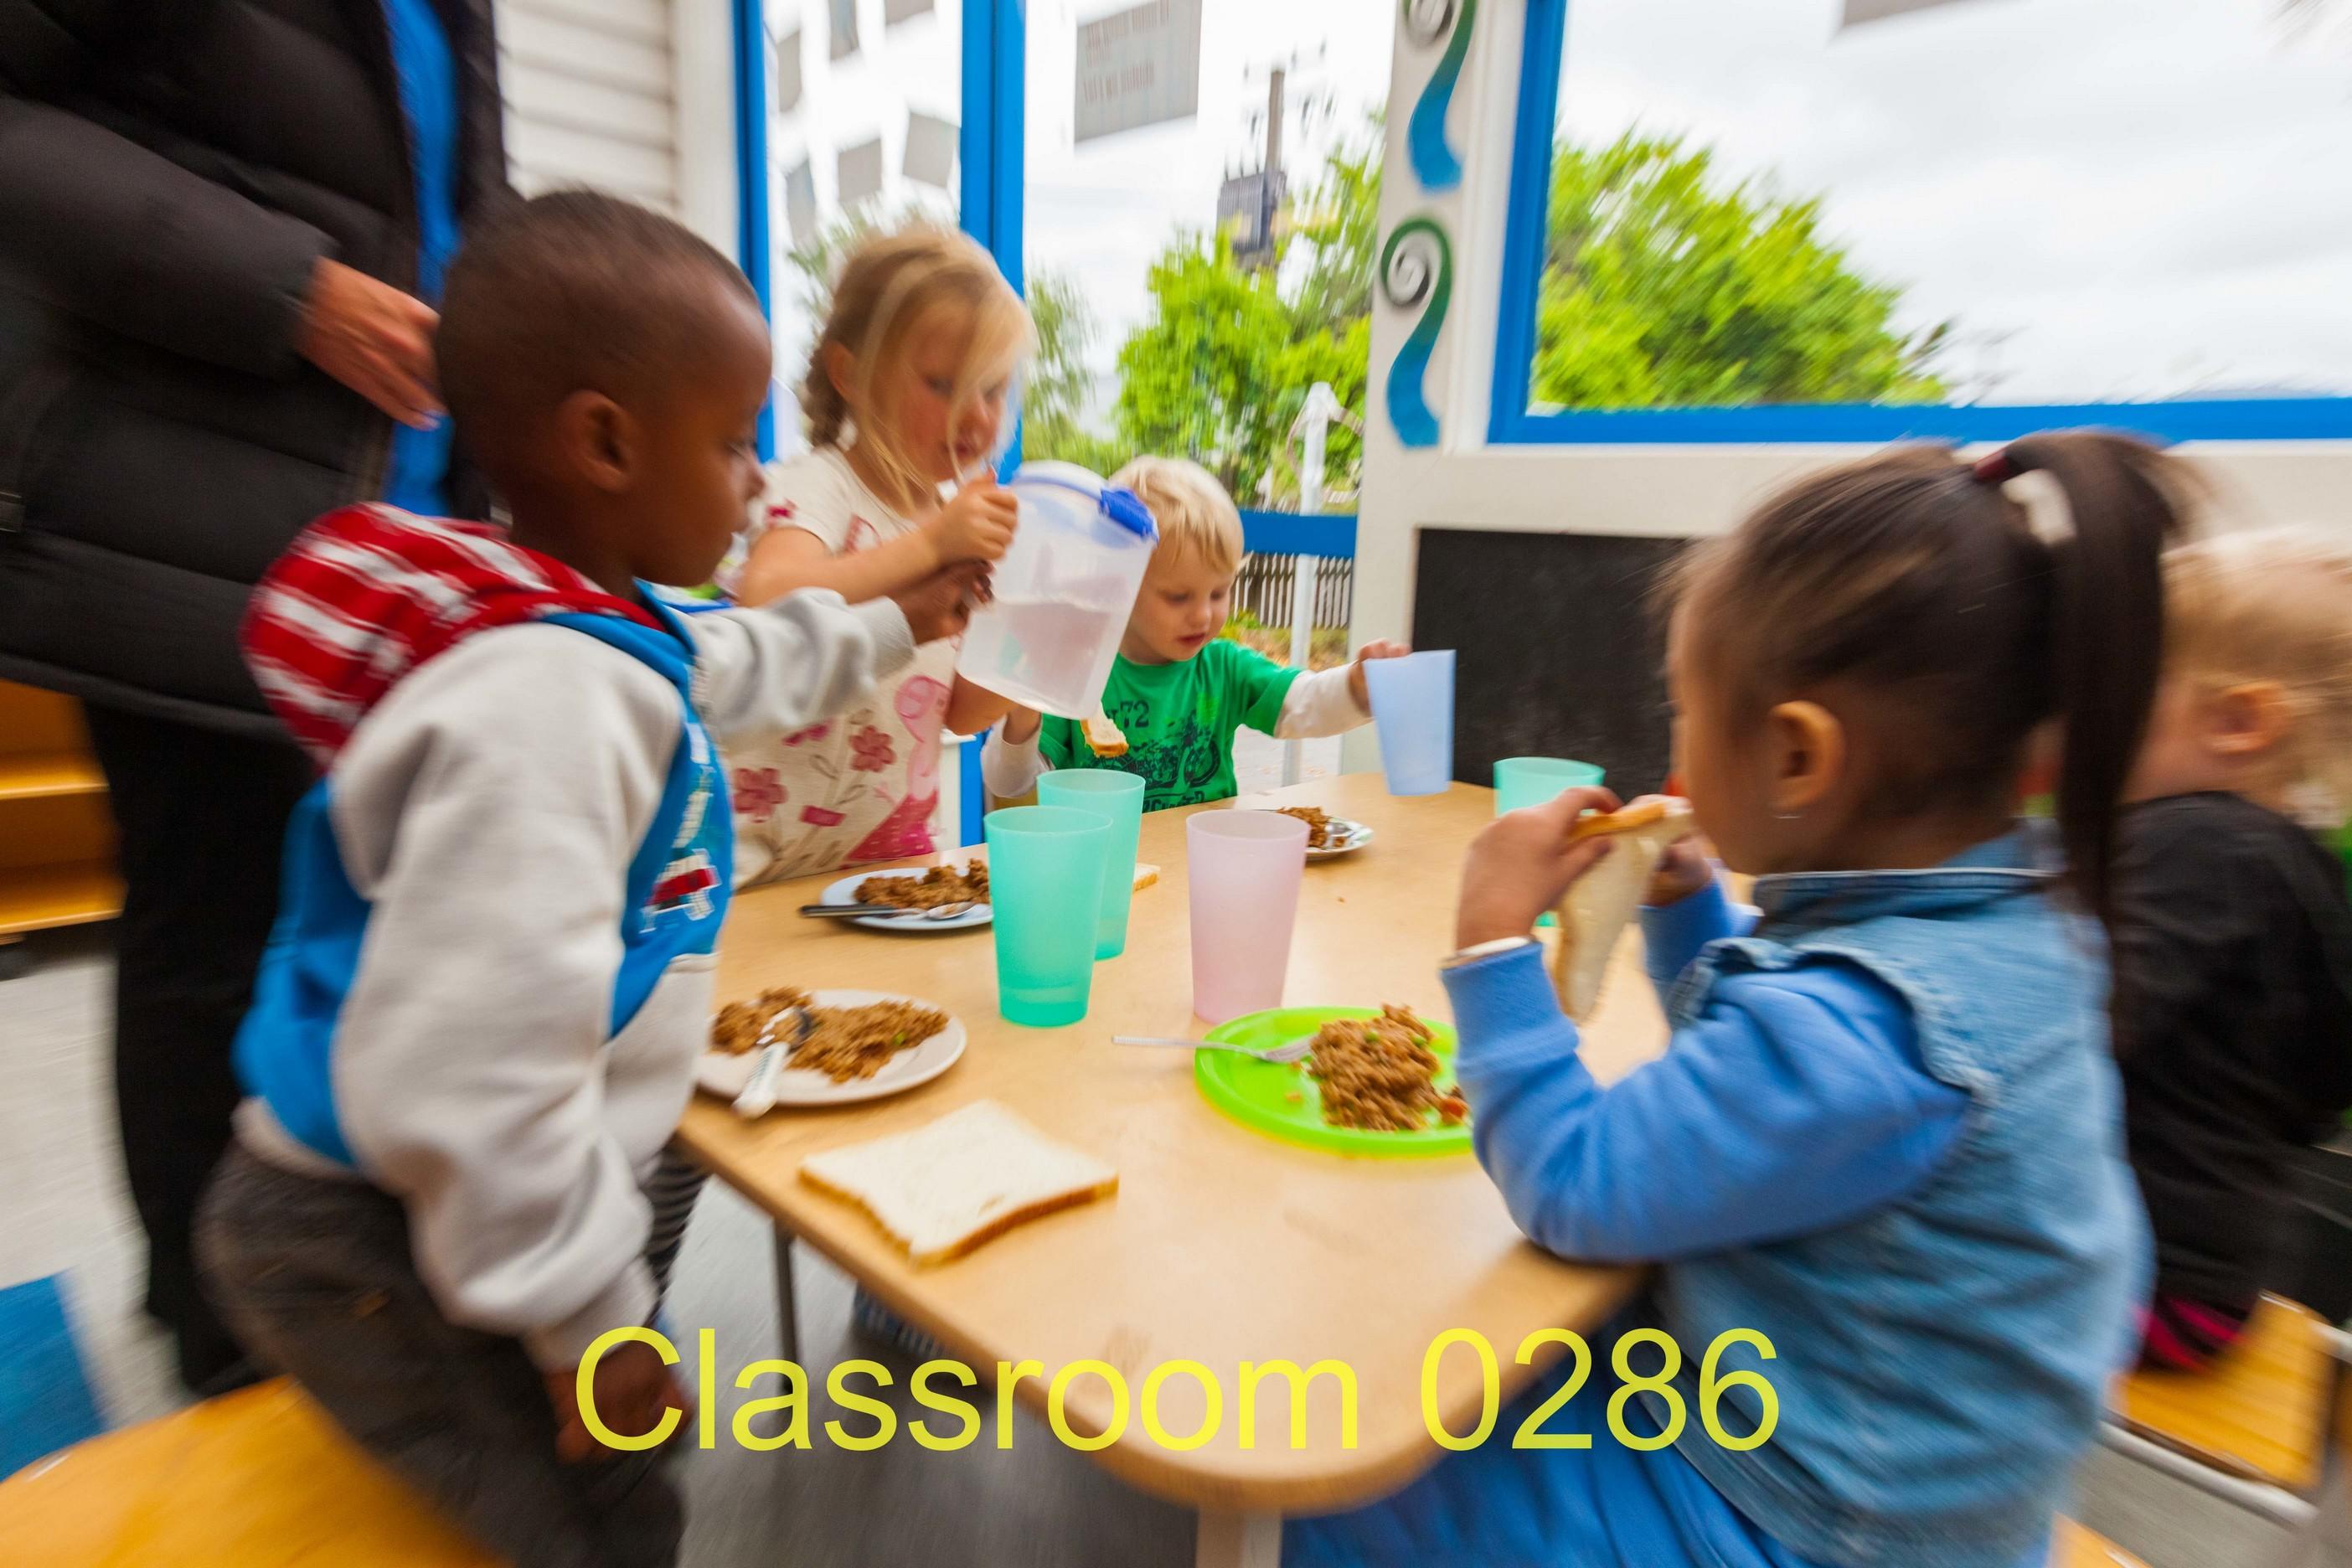 Classroom 0286